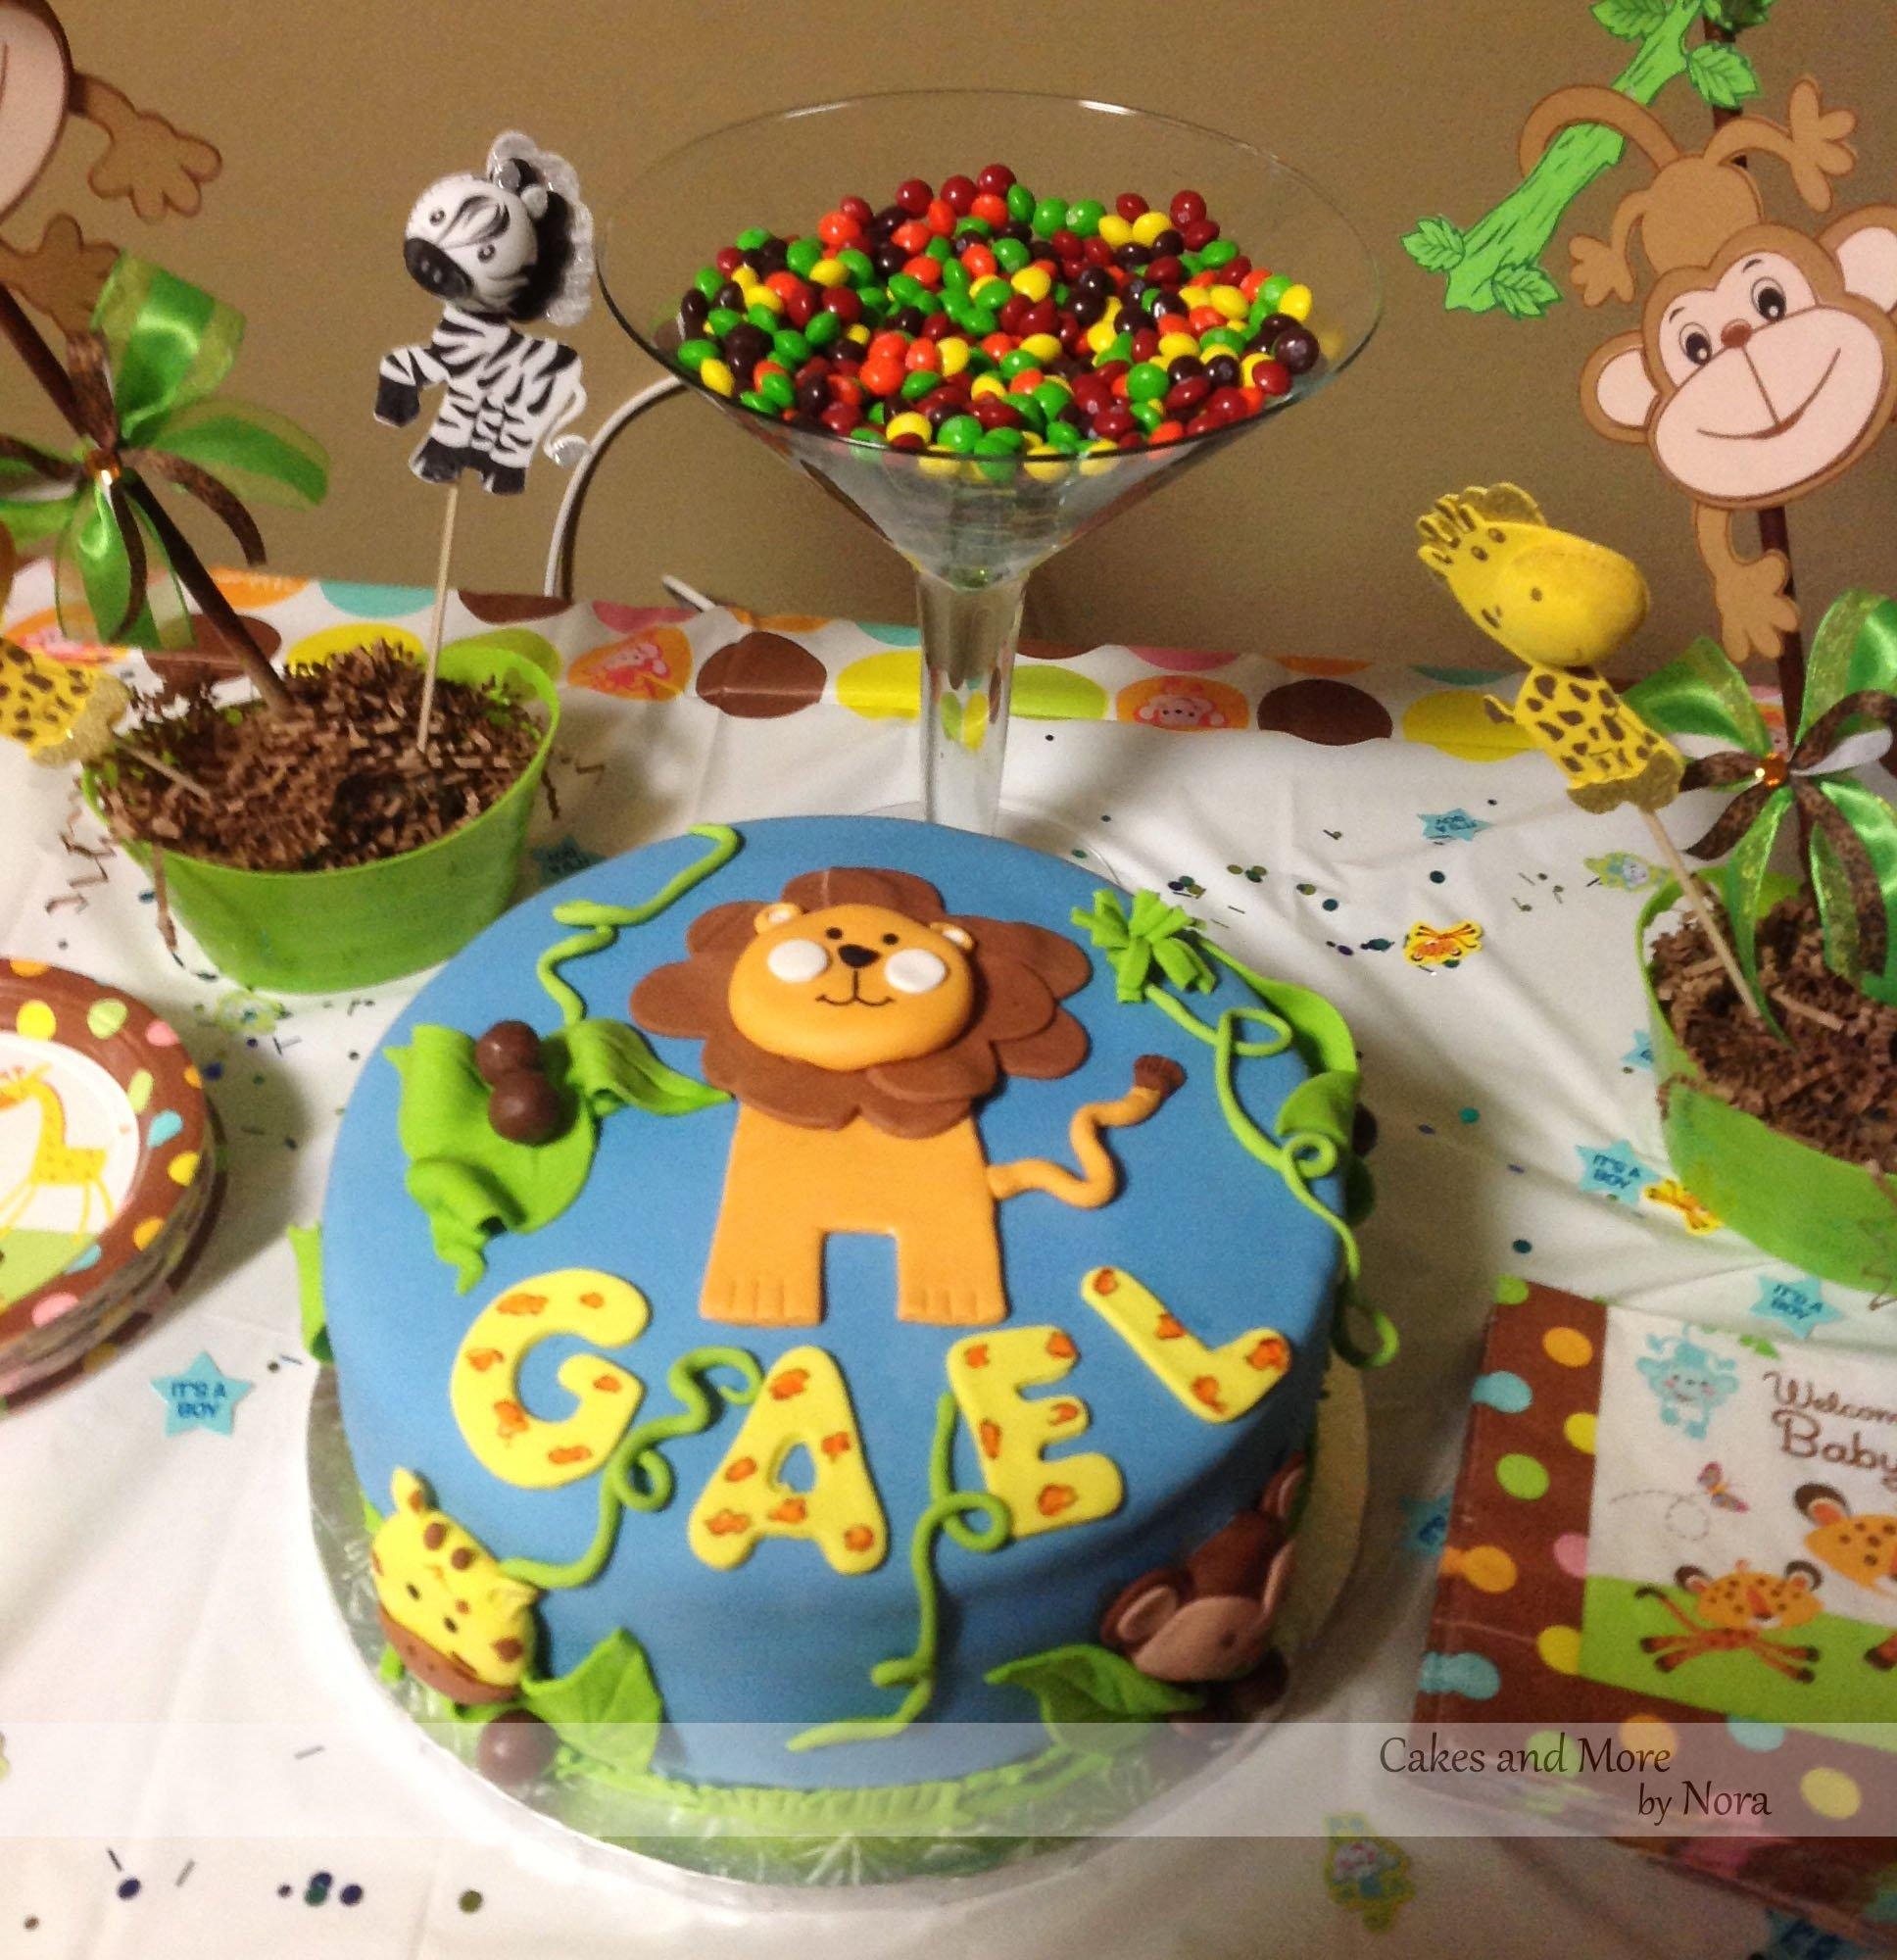 10 Stylish Safari Theme Baby Shower Ideas photo jungle themed baby shower image 2020